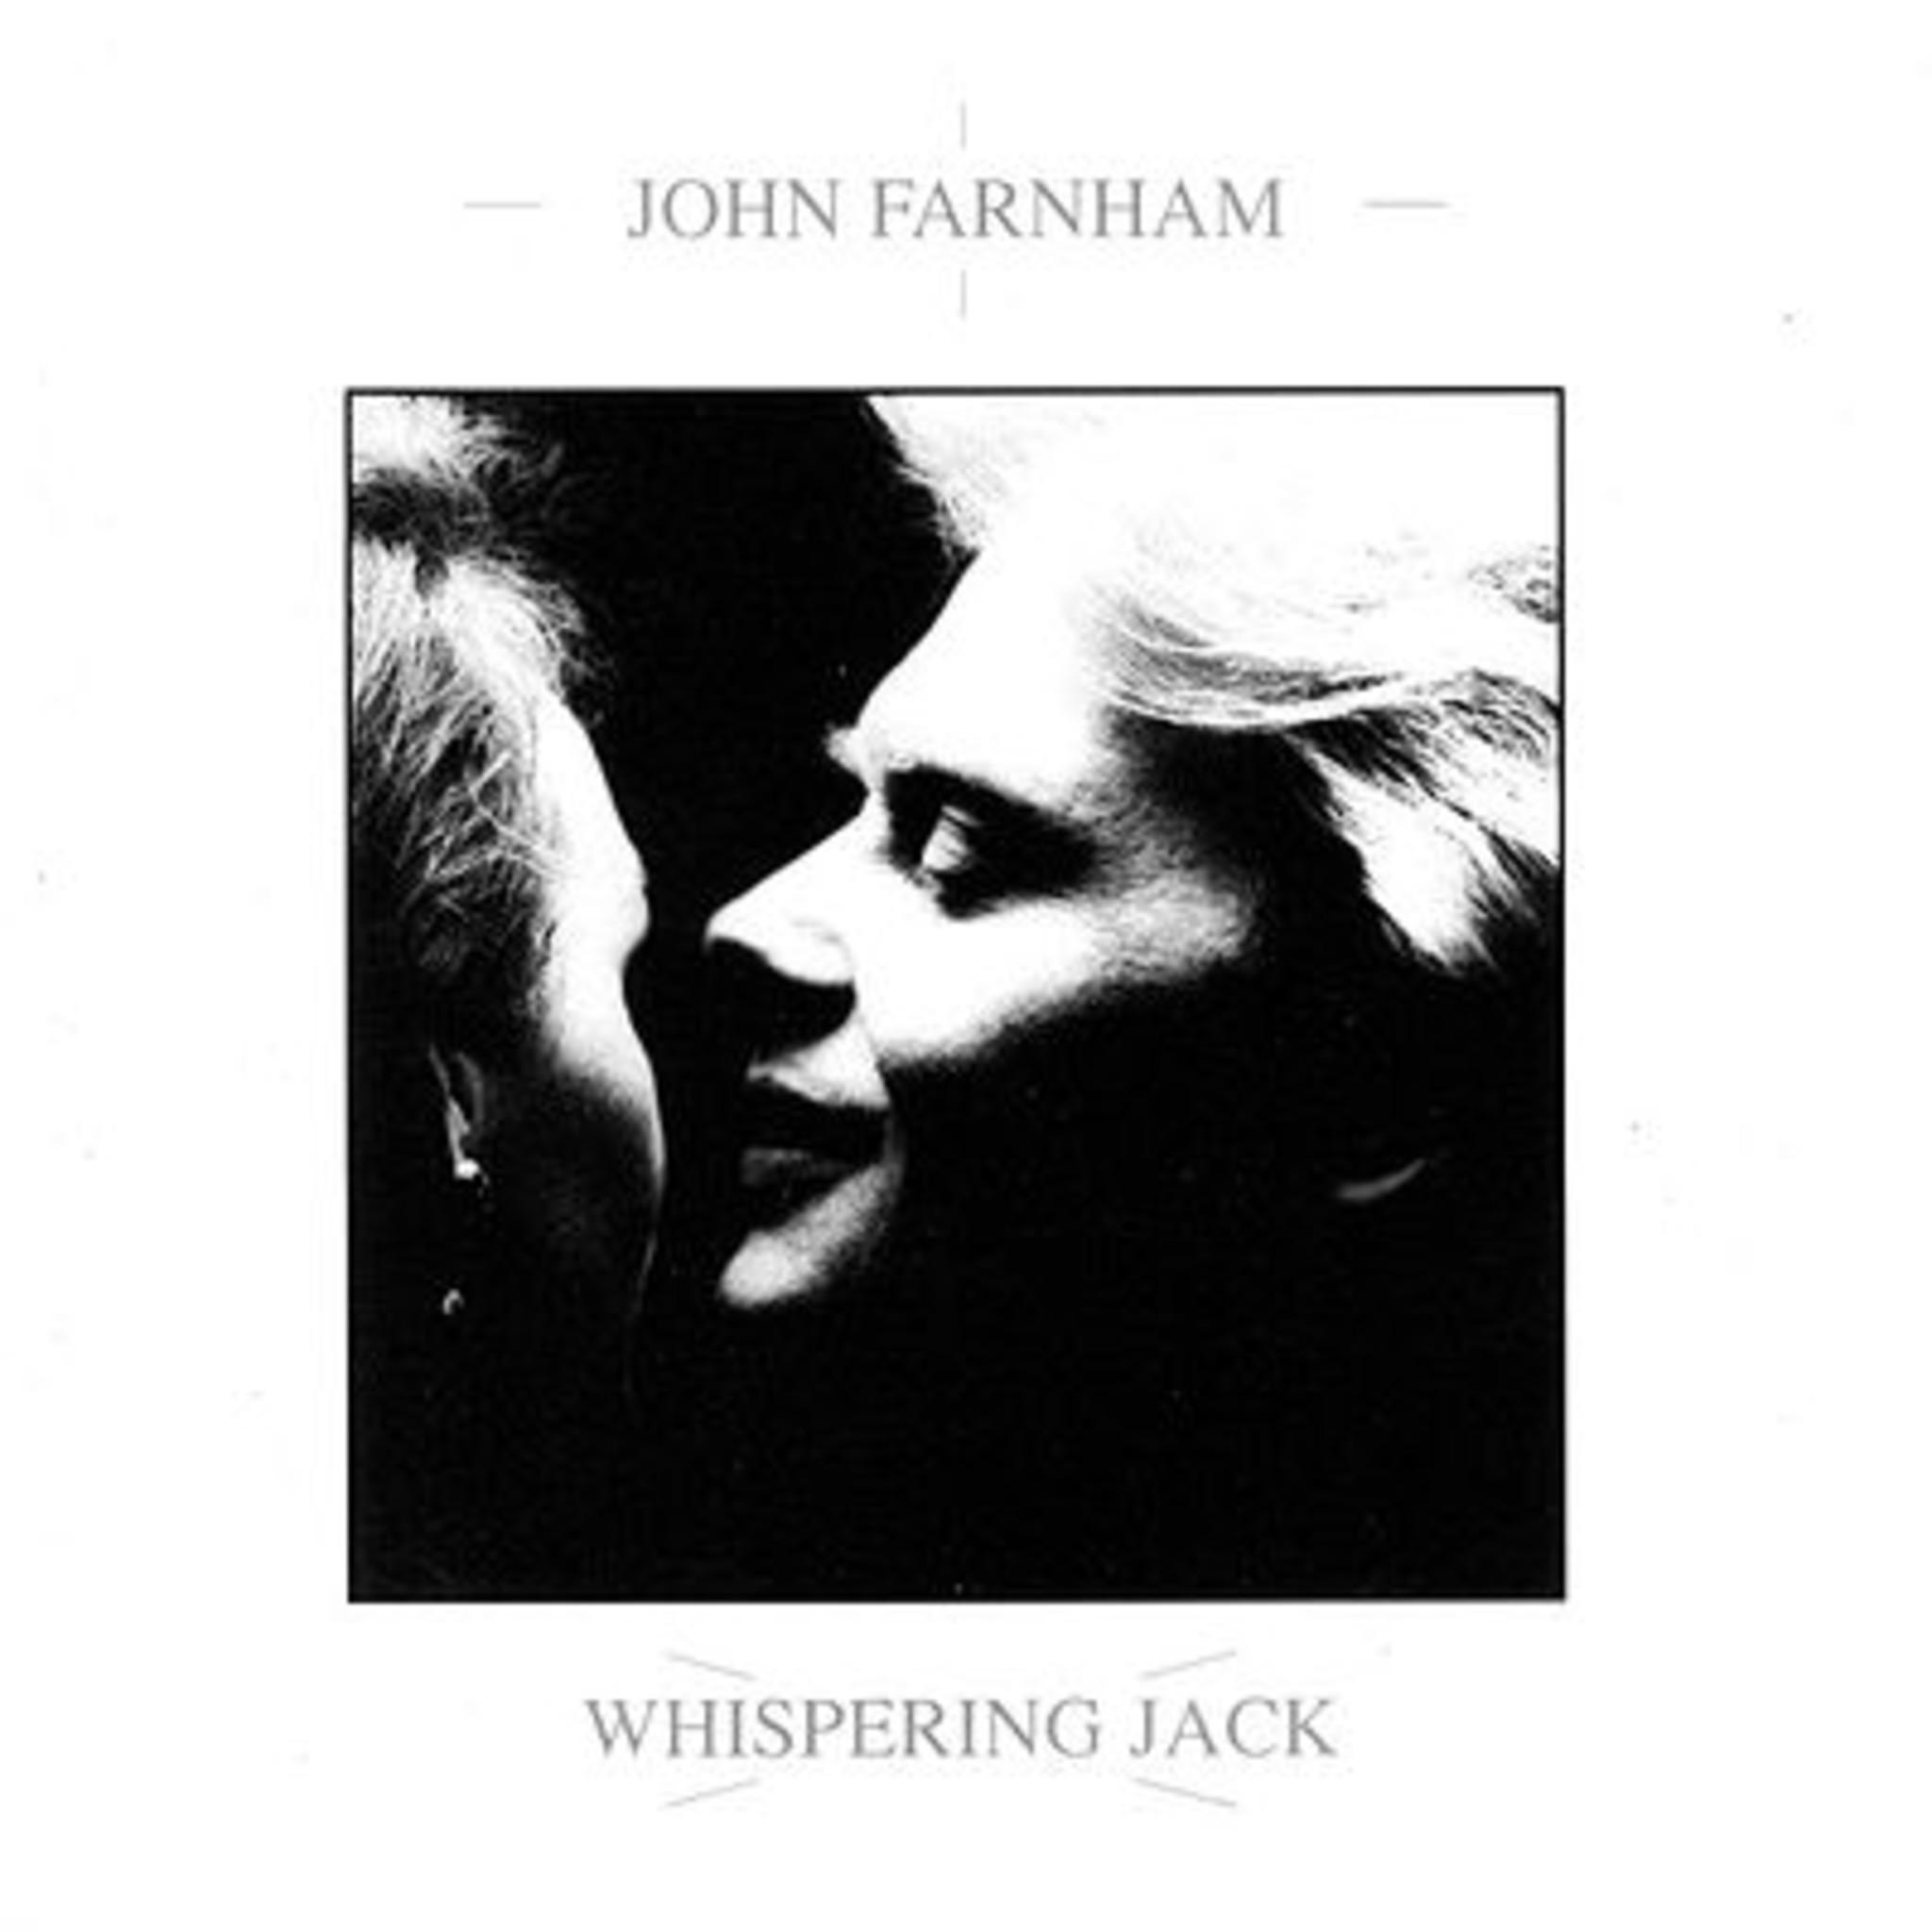 RadioWest - Glenn Wheatley on 30 years since John Farnham's Whispering Jack (Part 2)